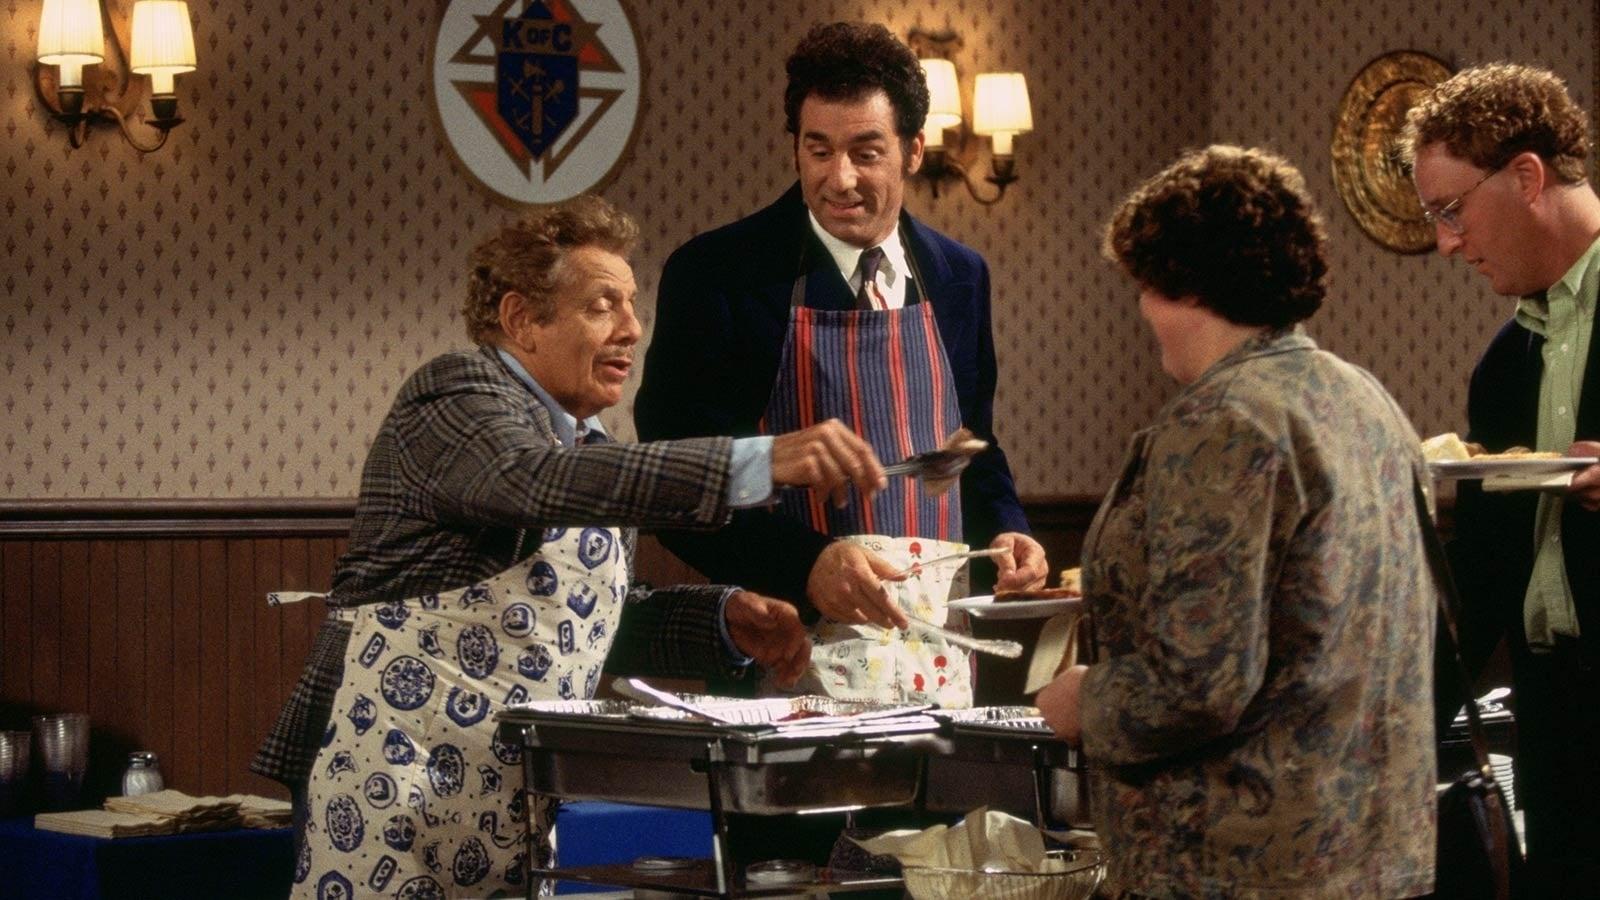 Seinfeld mentor dating Banya varva kronologi dating